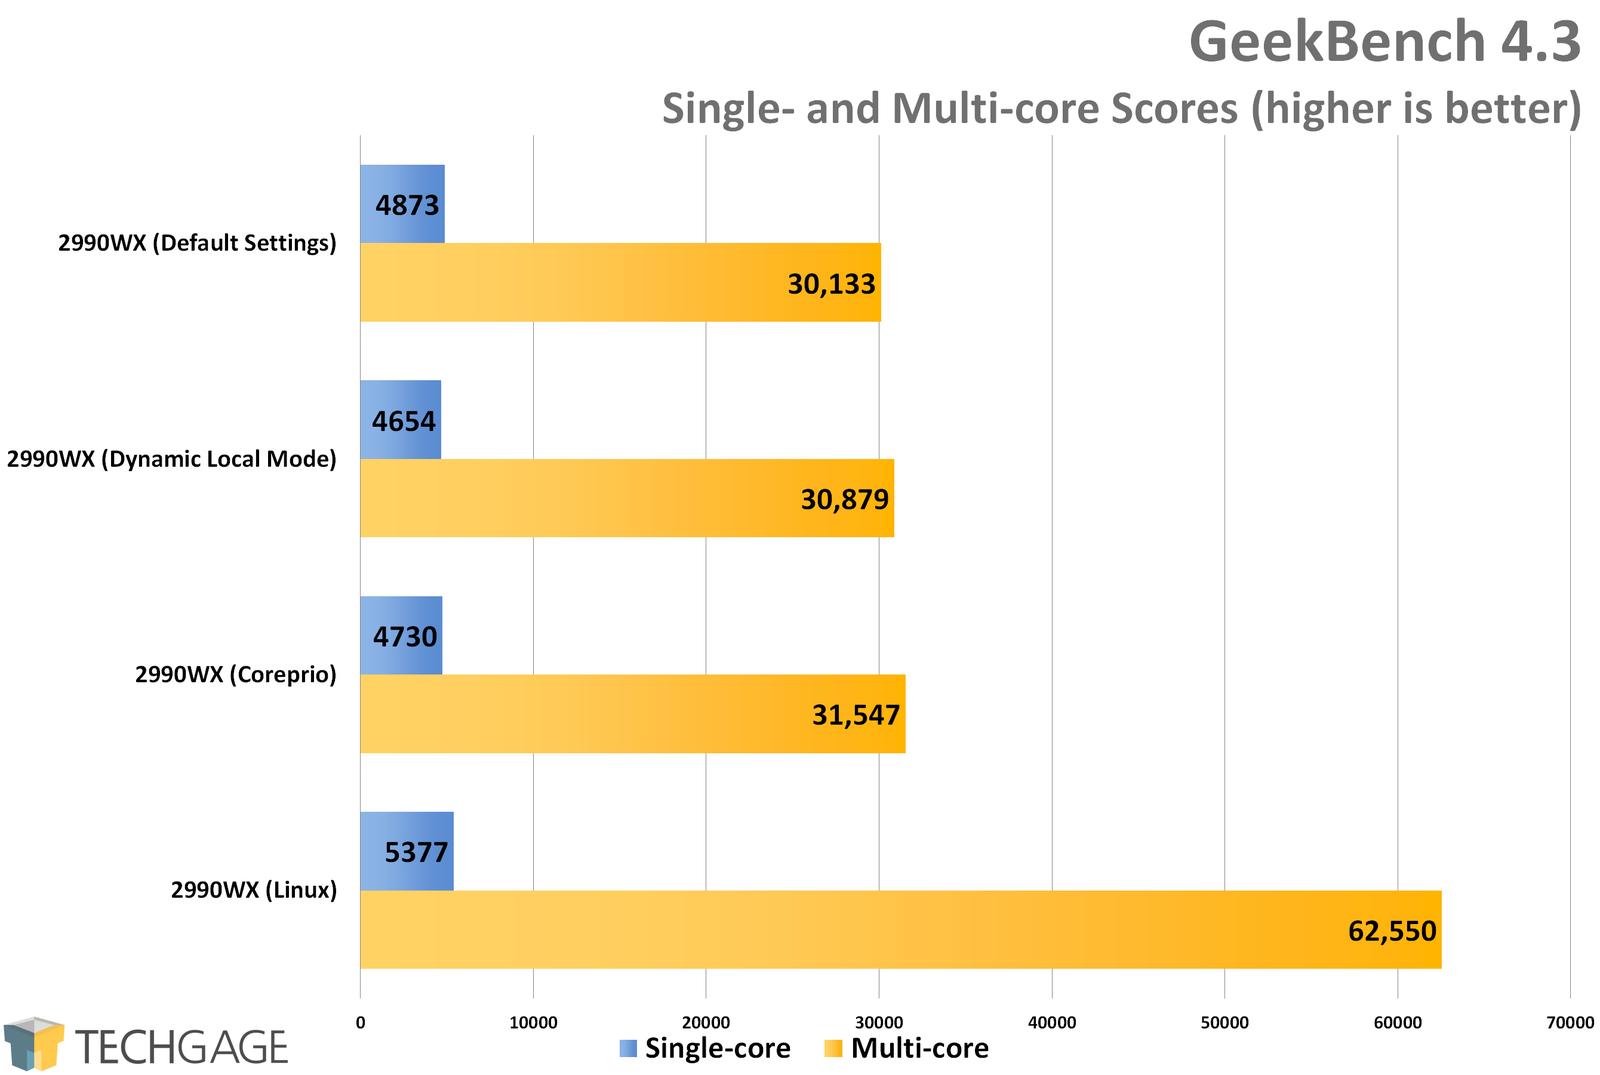 Ryzen Threadripper 2990WX Regressions: Dynamic Local Mode vs